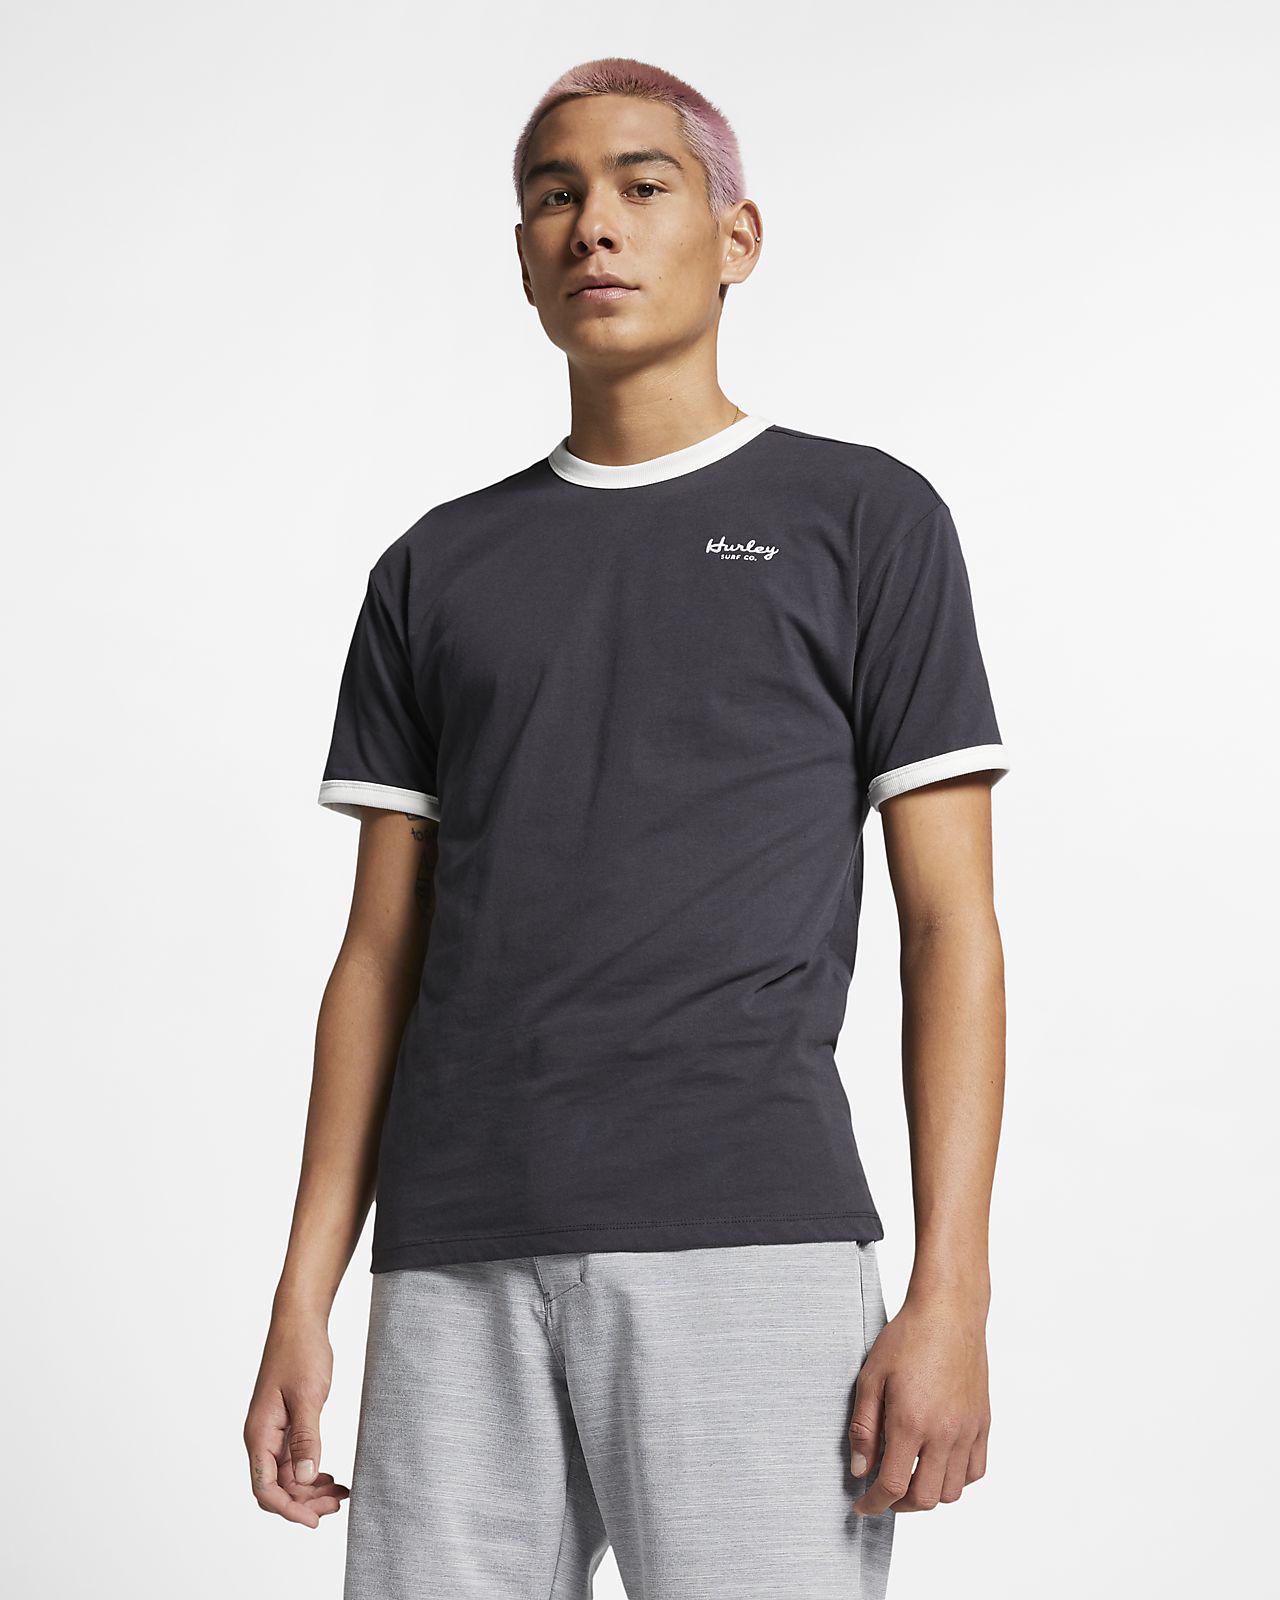 149a90f4 Hurley Dri-FIT Harvey Ringer Men's Short-Sleeve Top. Nike.com ZA